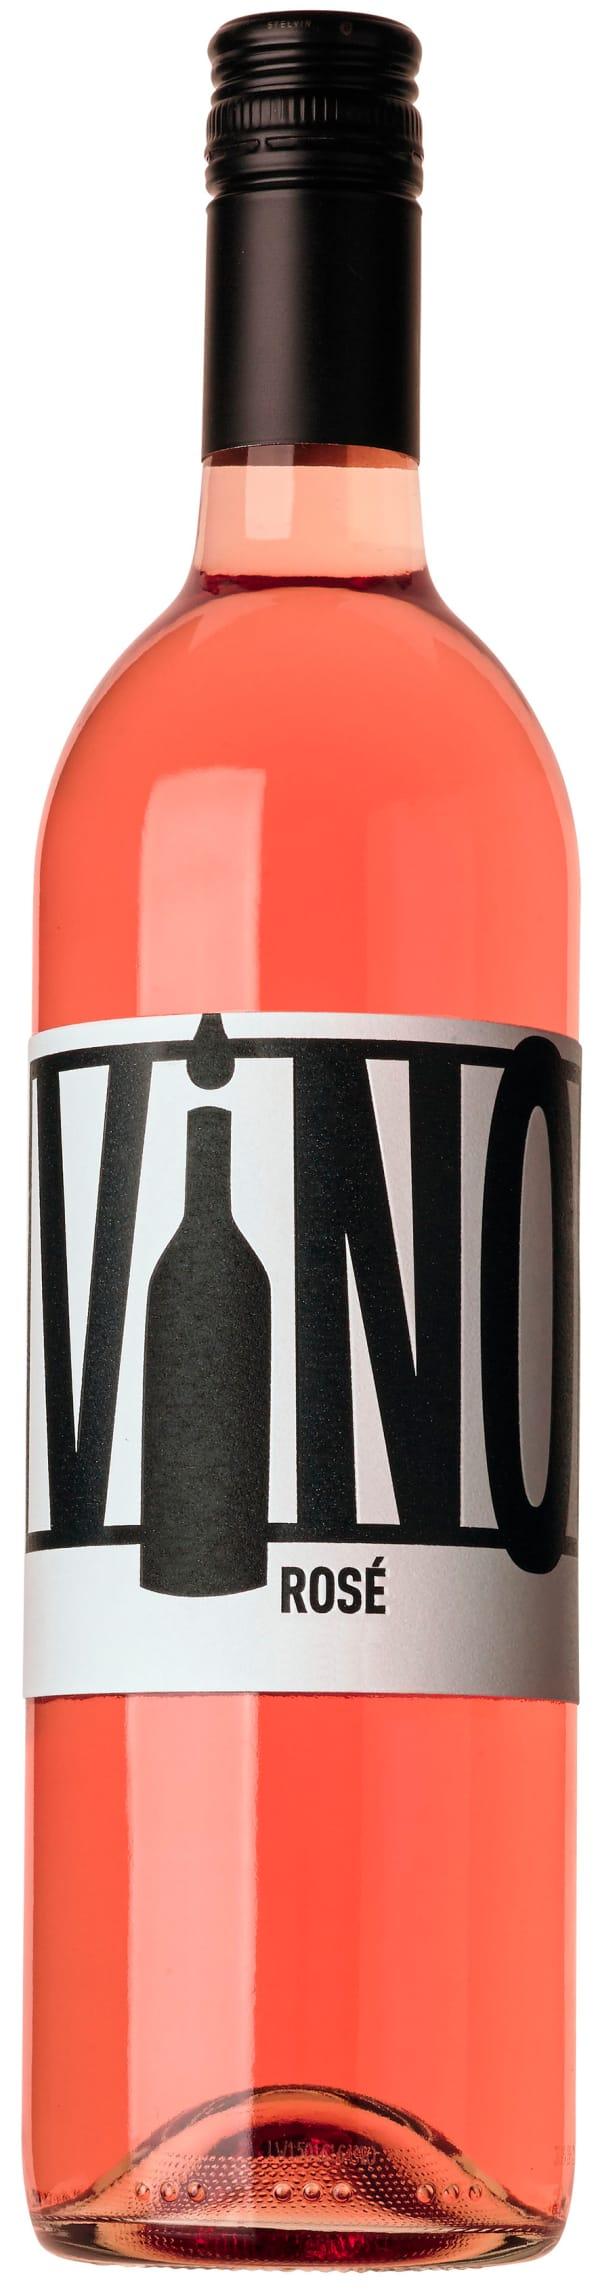 Vino Rosé by Charles Smith 2016